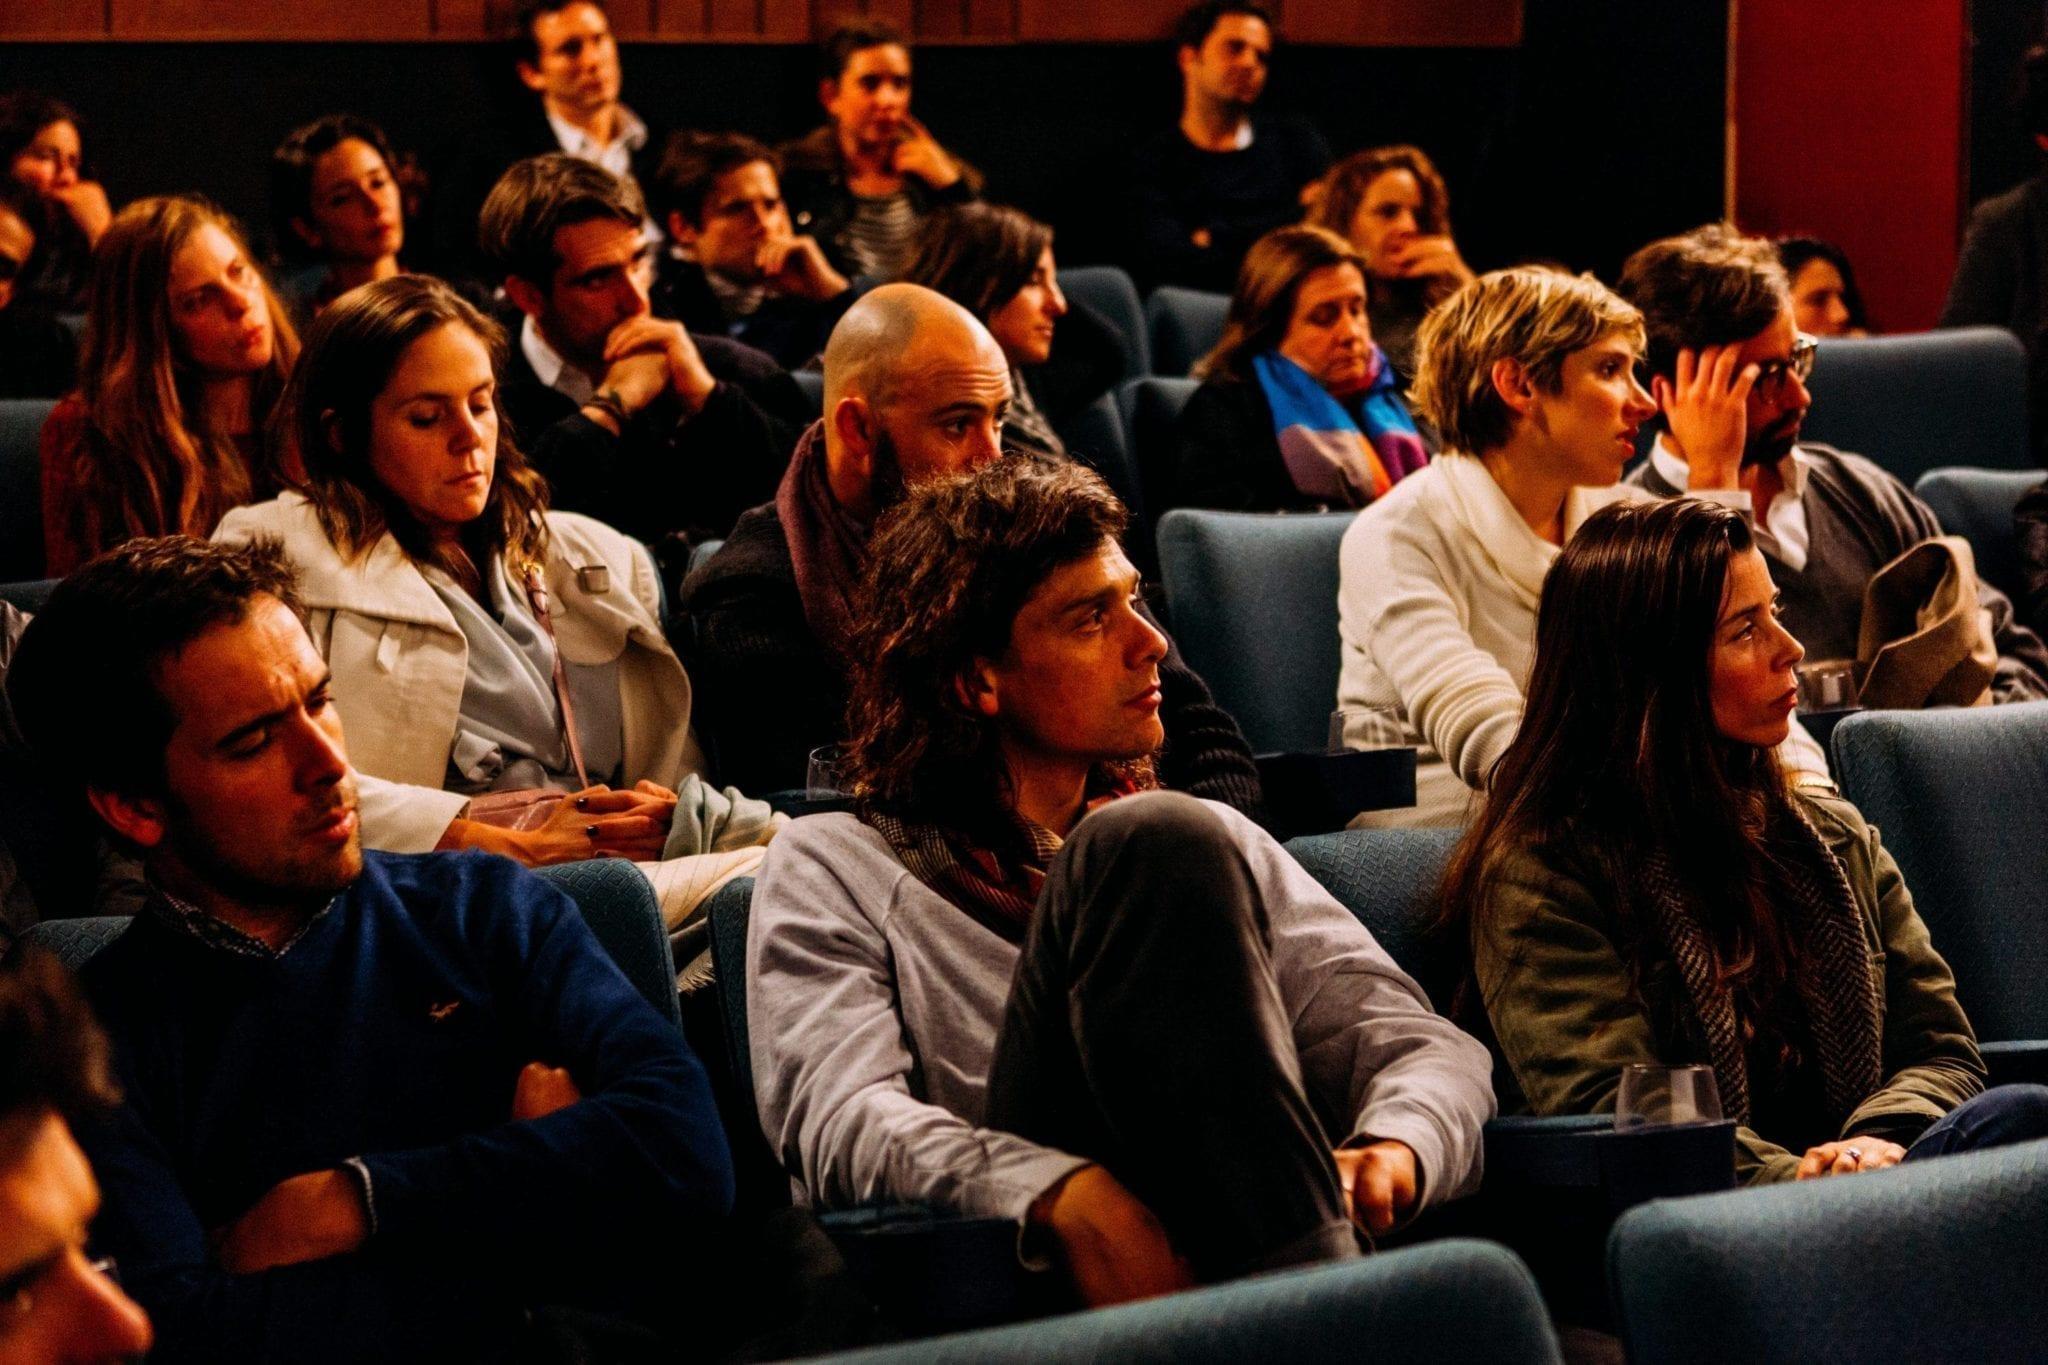 Evento de grupo focal: Definir su público objetivo.